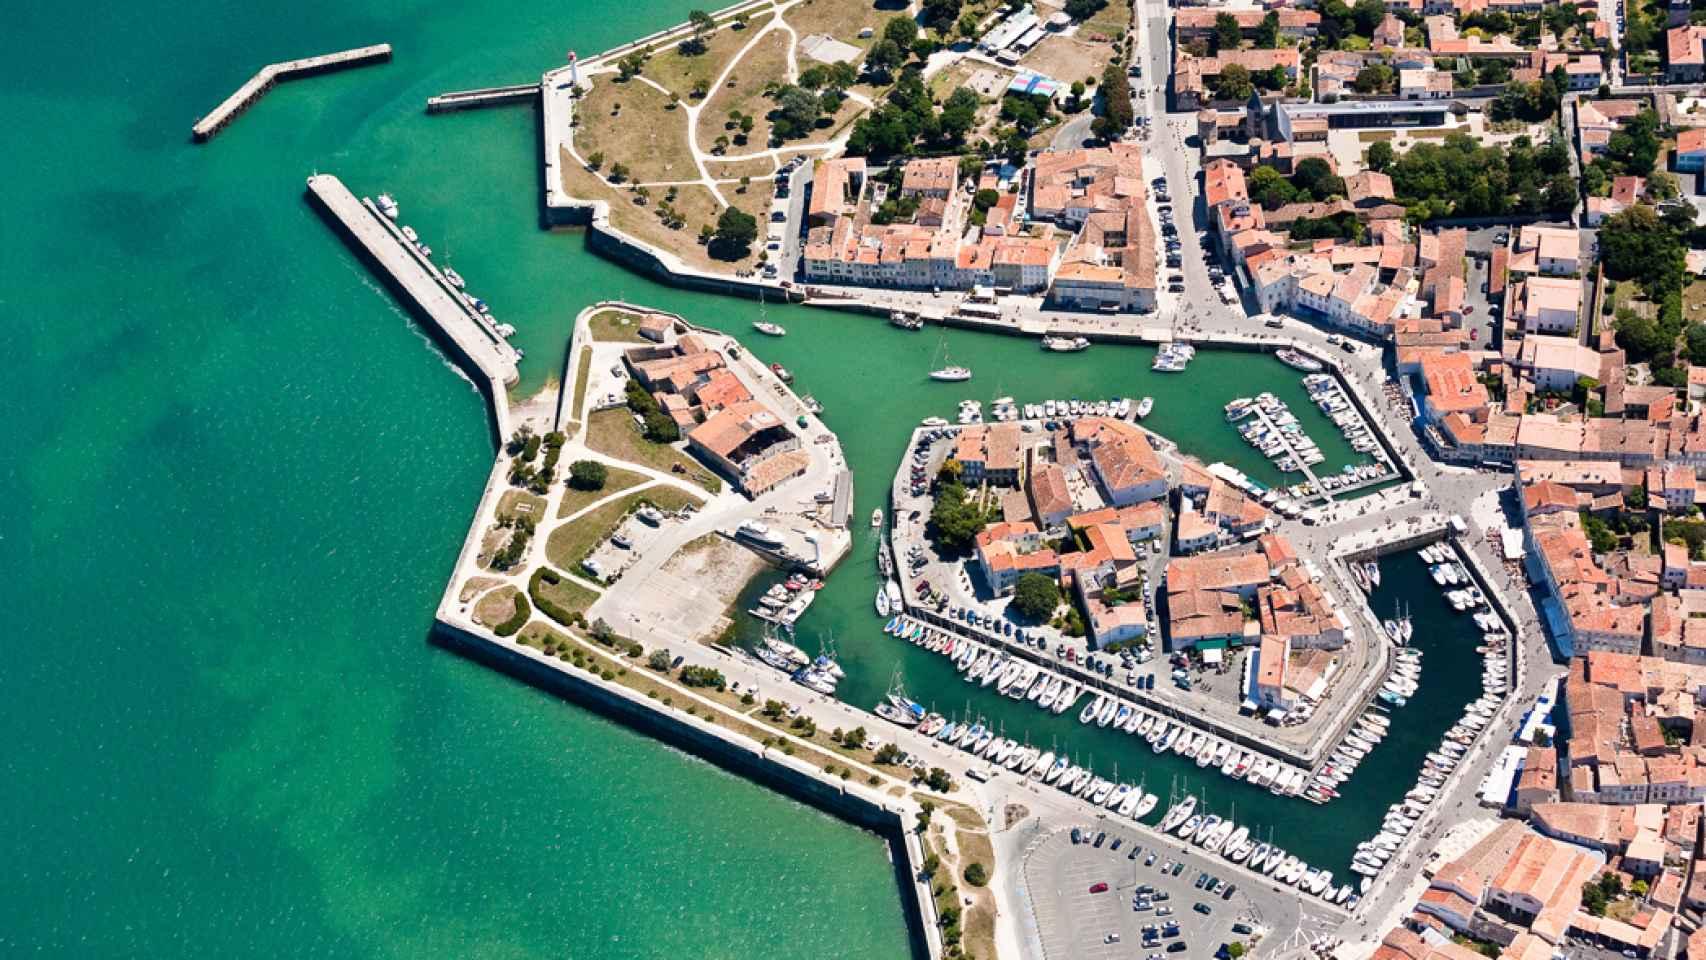 Imagen aérea de la Isla de Ré.